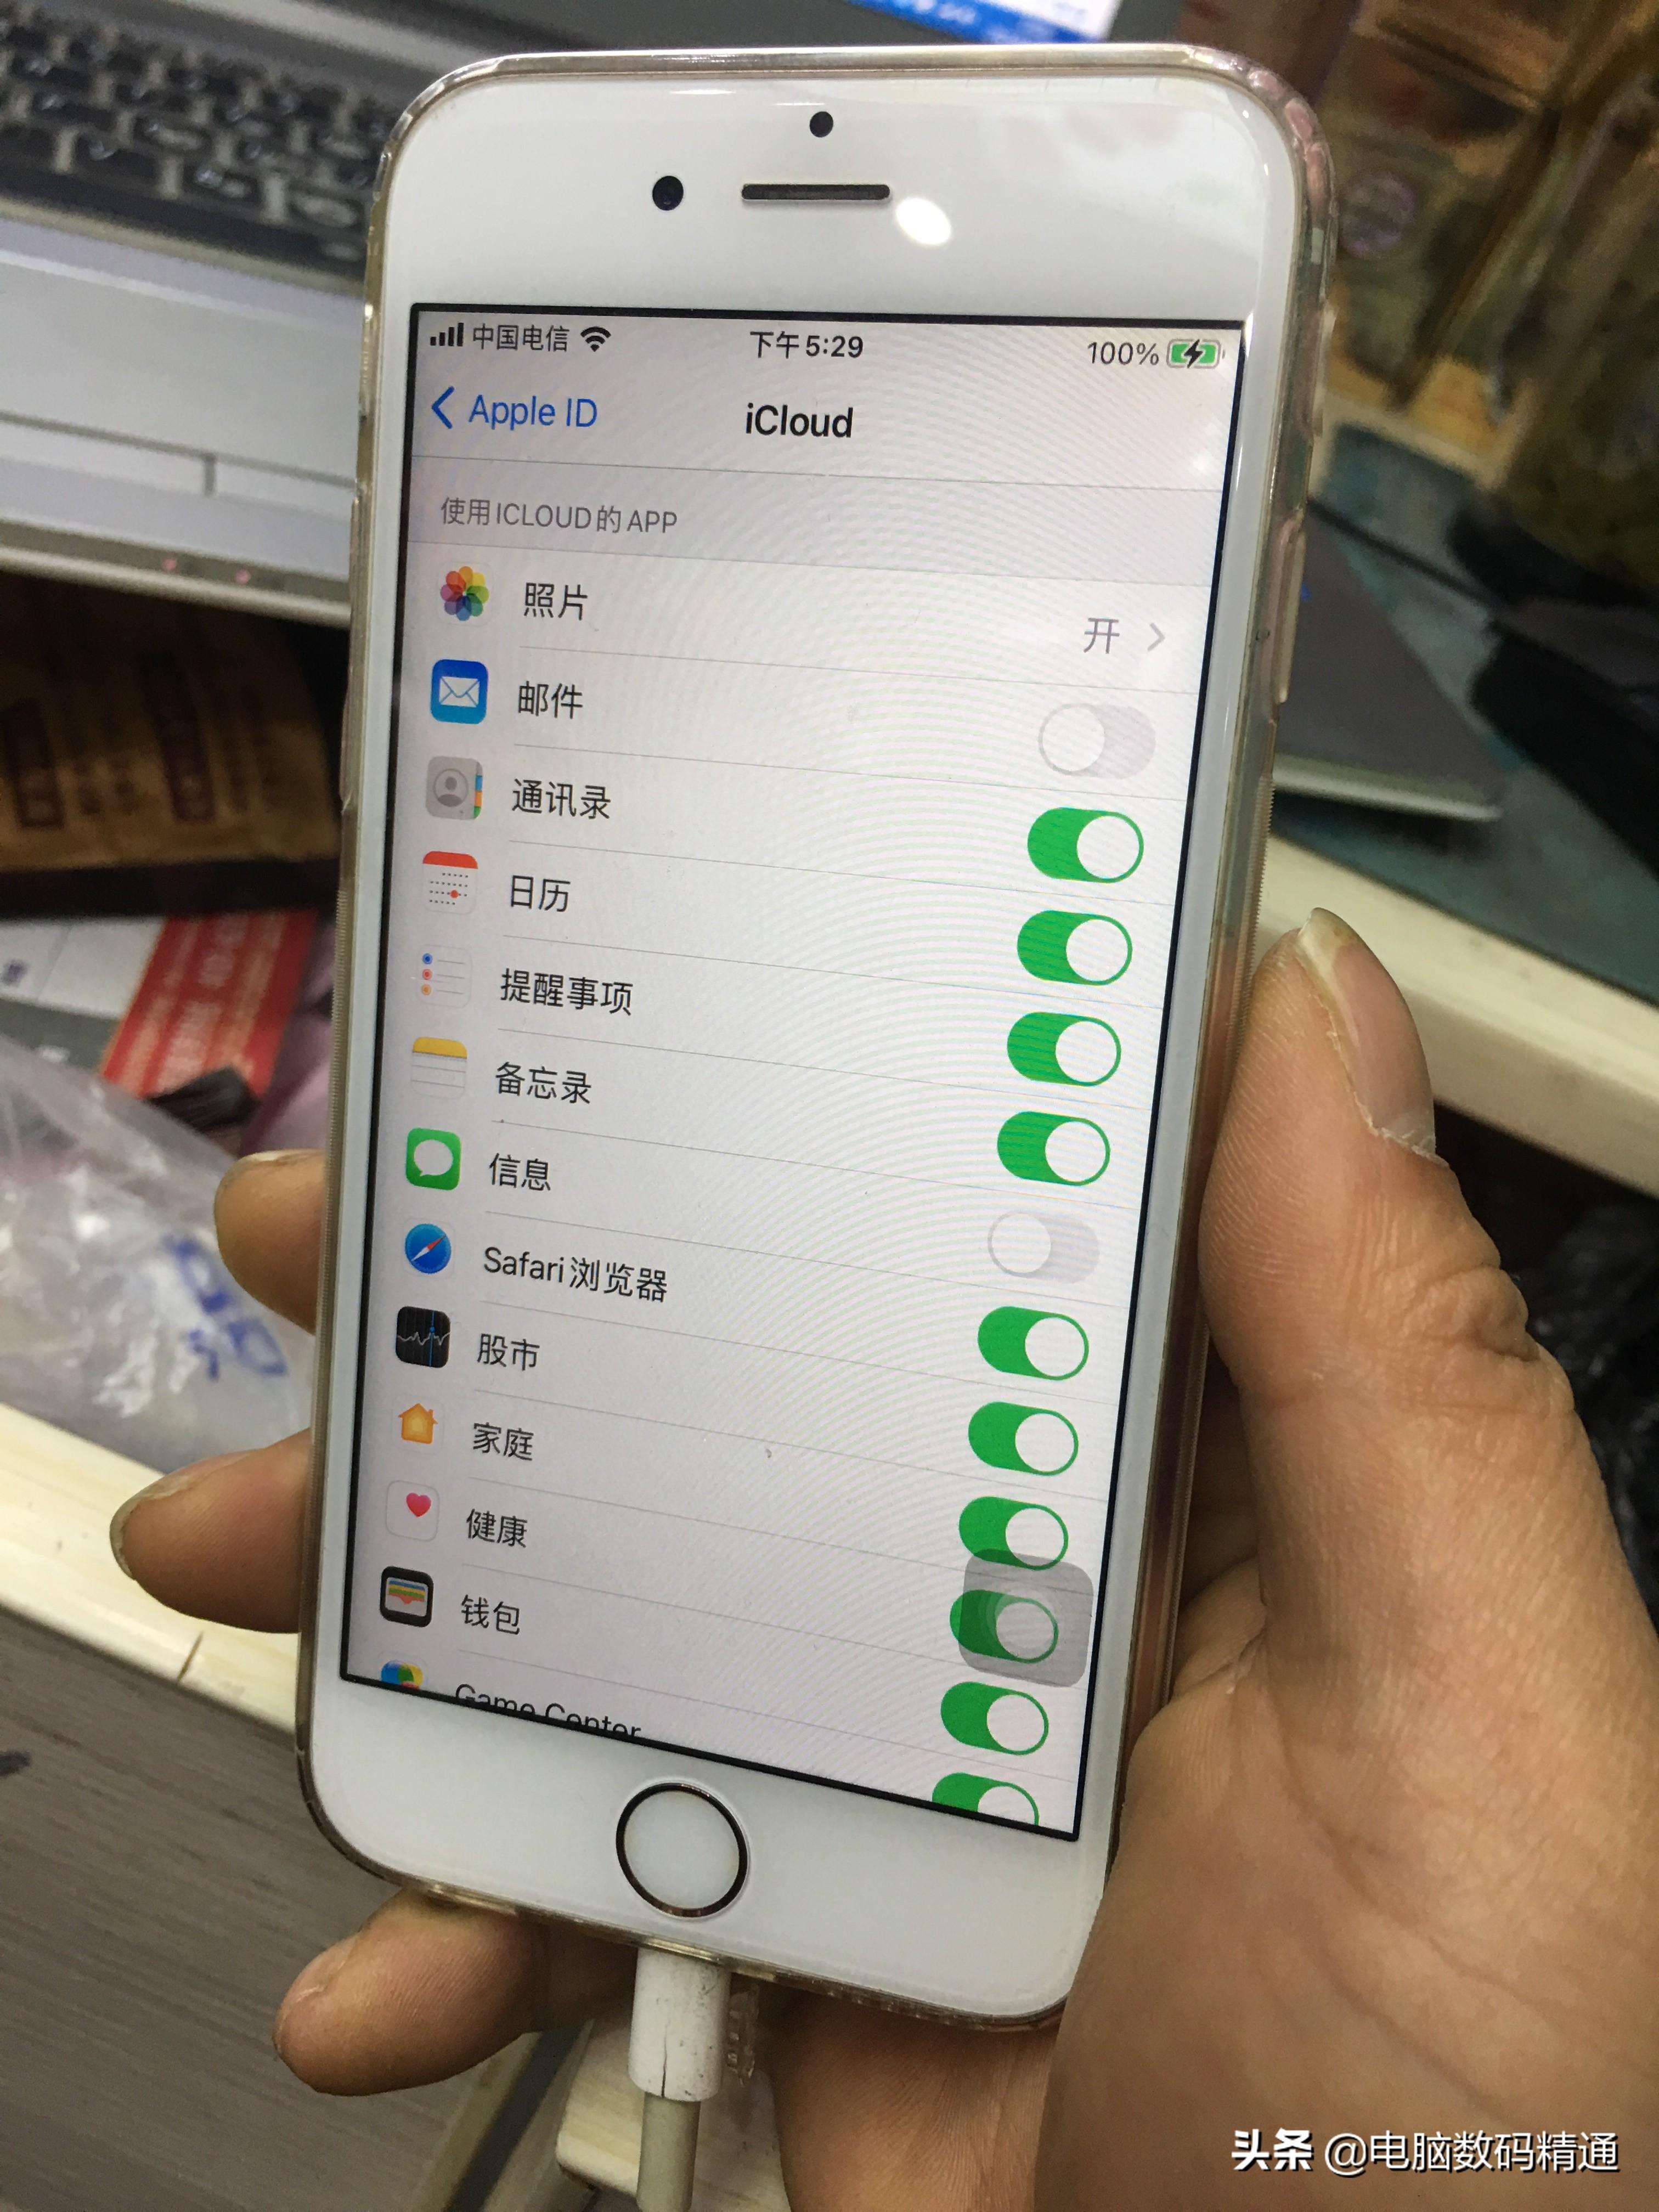 iphone迁移数据到新手机(苹果手机数据迁移详细教程)